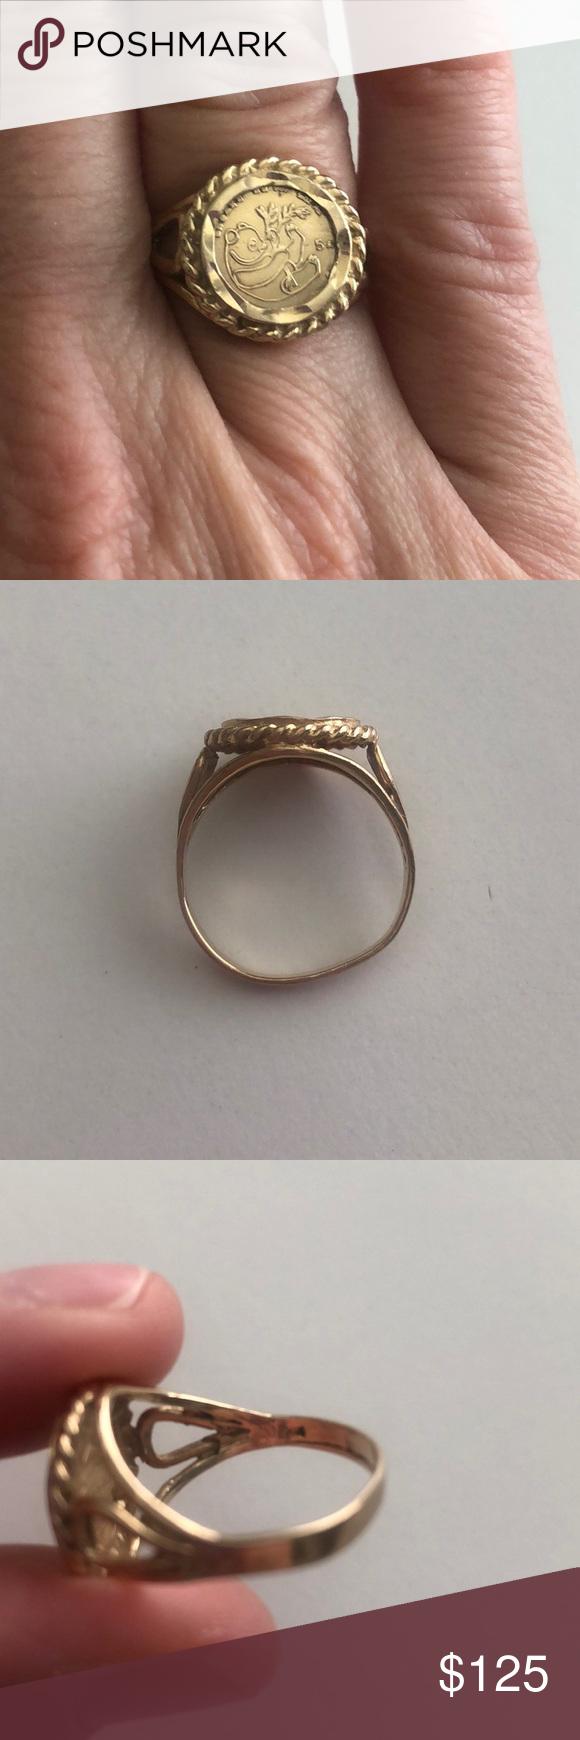 Vintage 10k Gold Panda Coin Copy Ring Womens Jewelry Rings Vintage Jewellery Rings 10k Gold